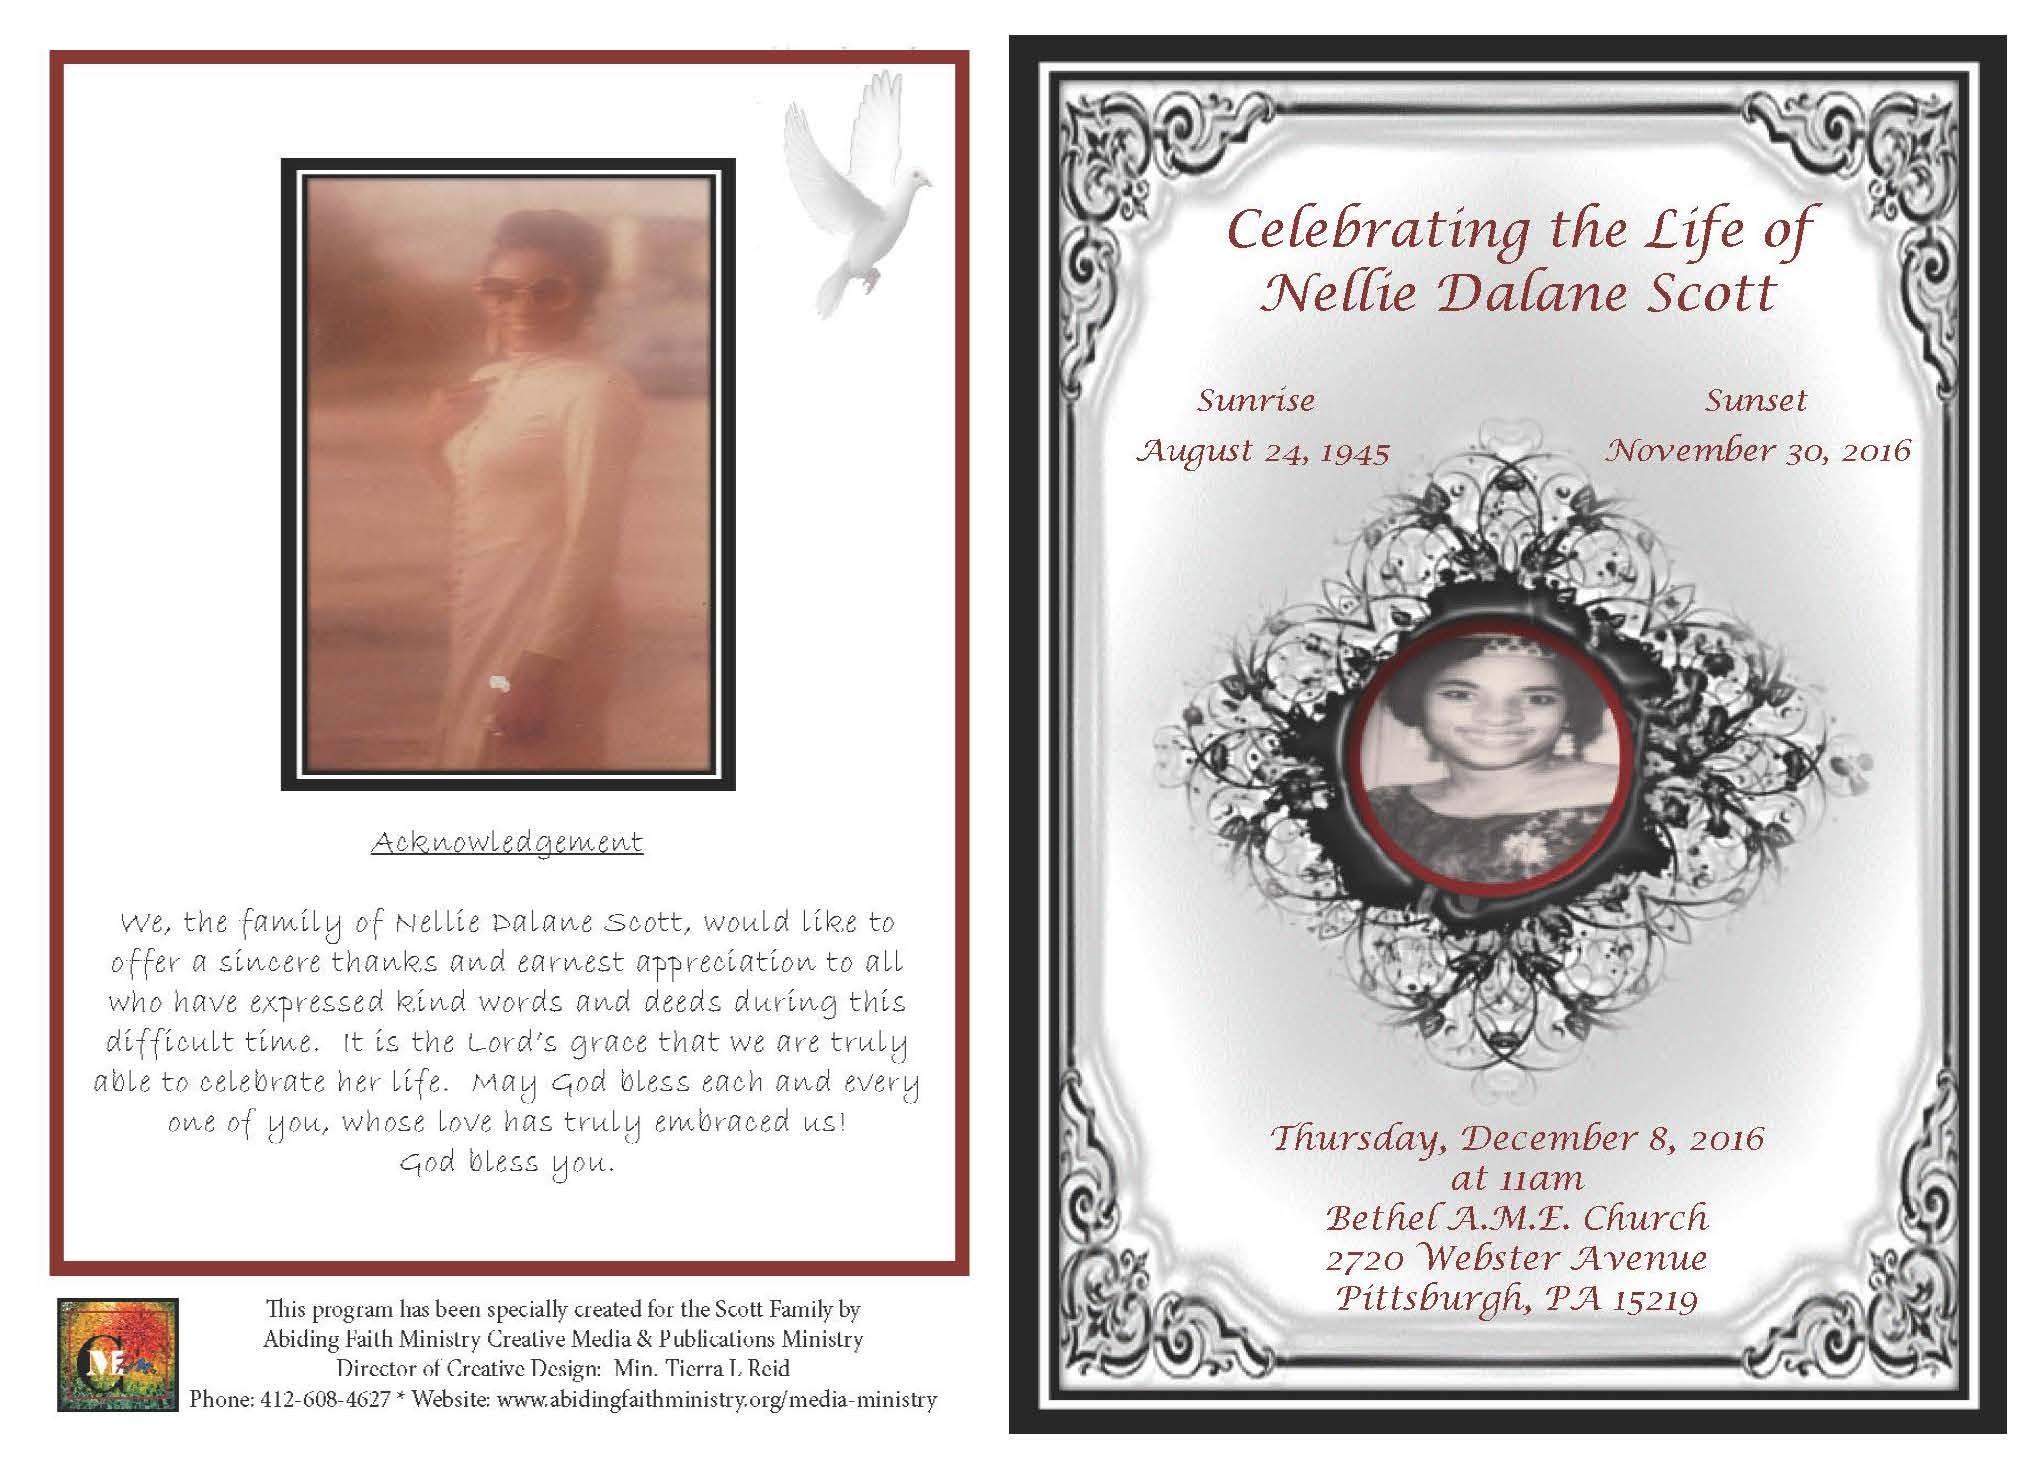 Nellie Dalane Scott FP31_Page_1